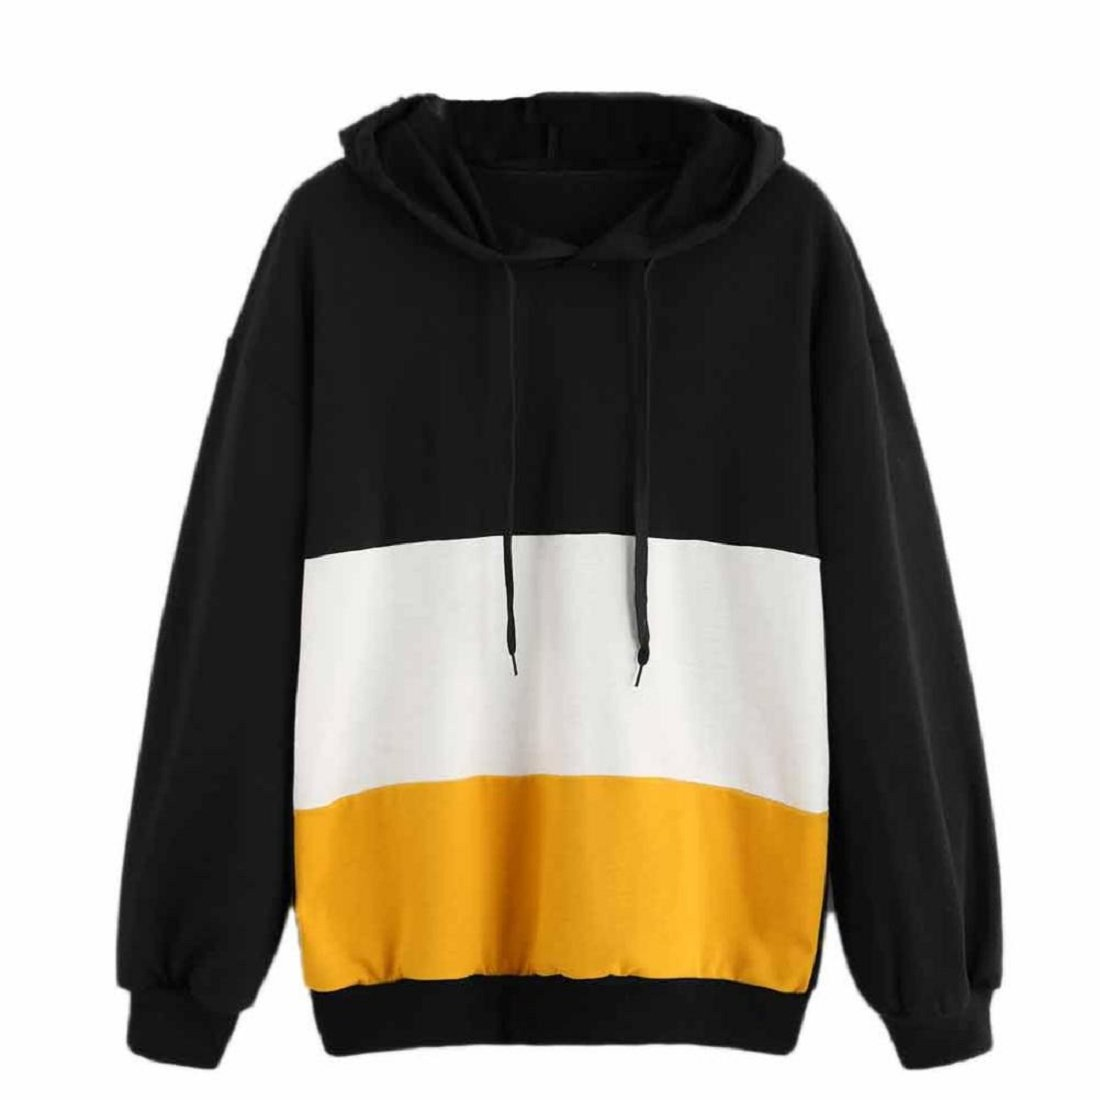 GONKOMA Autumn New Women Stripe Patchwork Hoodie Sweatshirt Pullover Casual Jumper Sweater Tops XWJ520